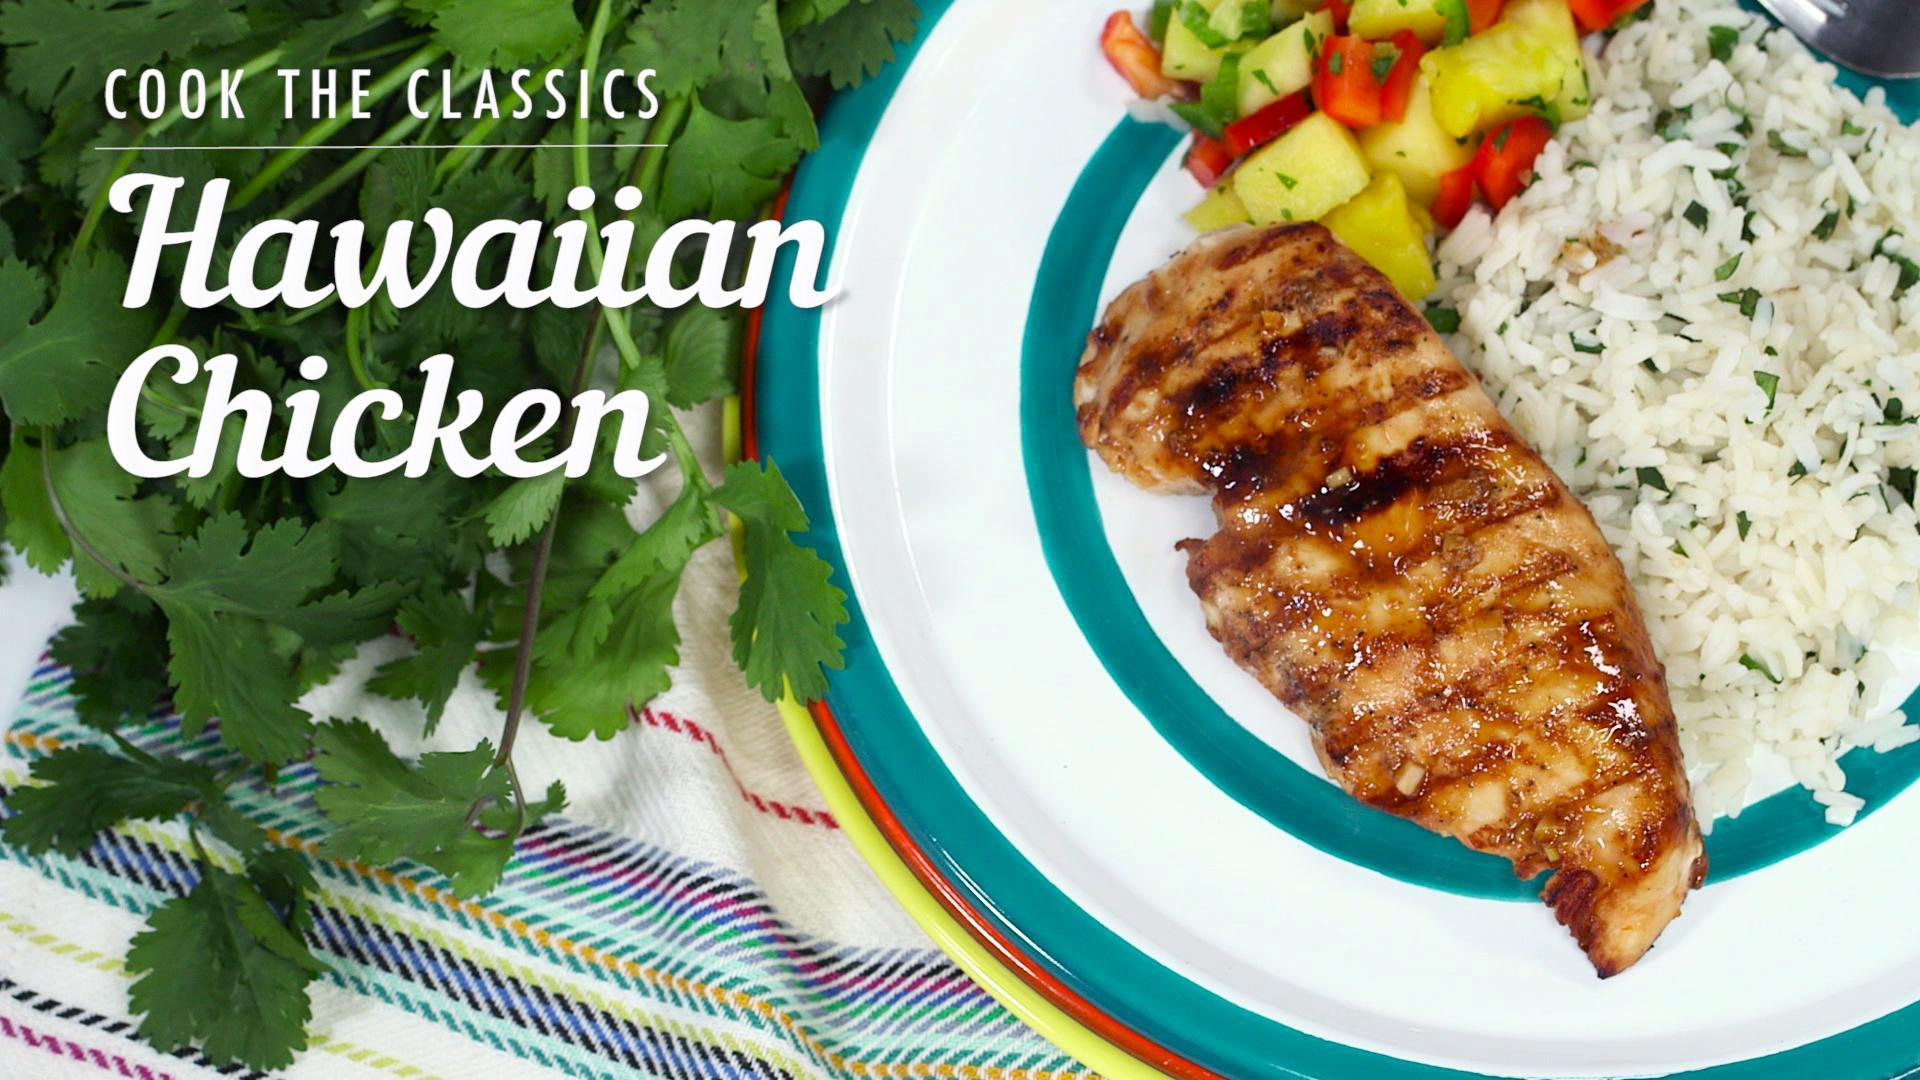 How to Make Classic Hawaiian Chicken